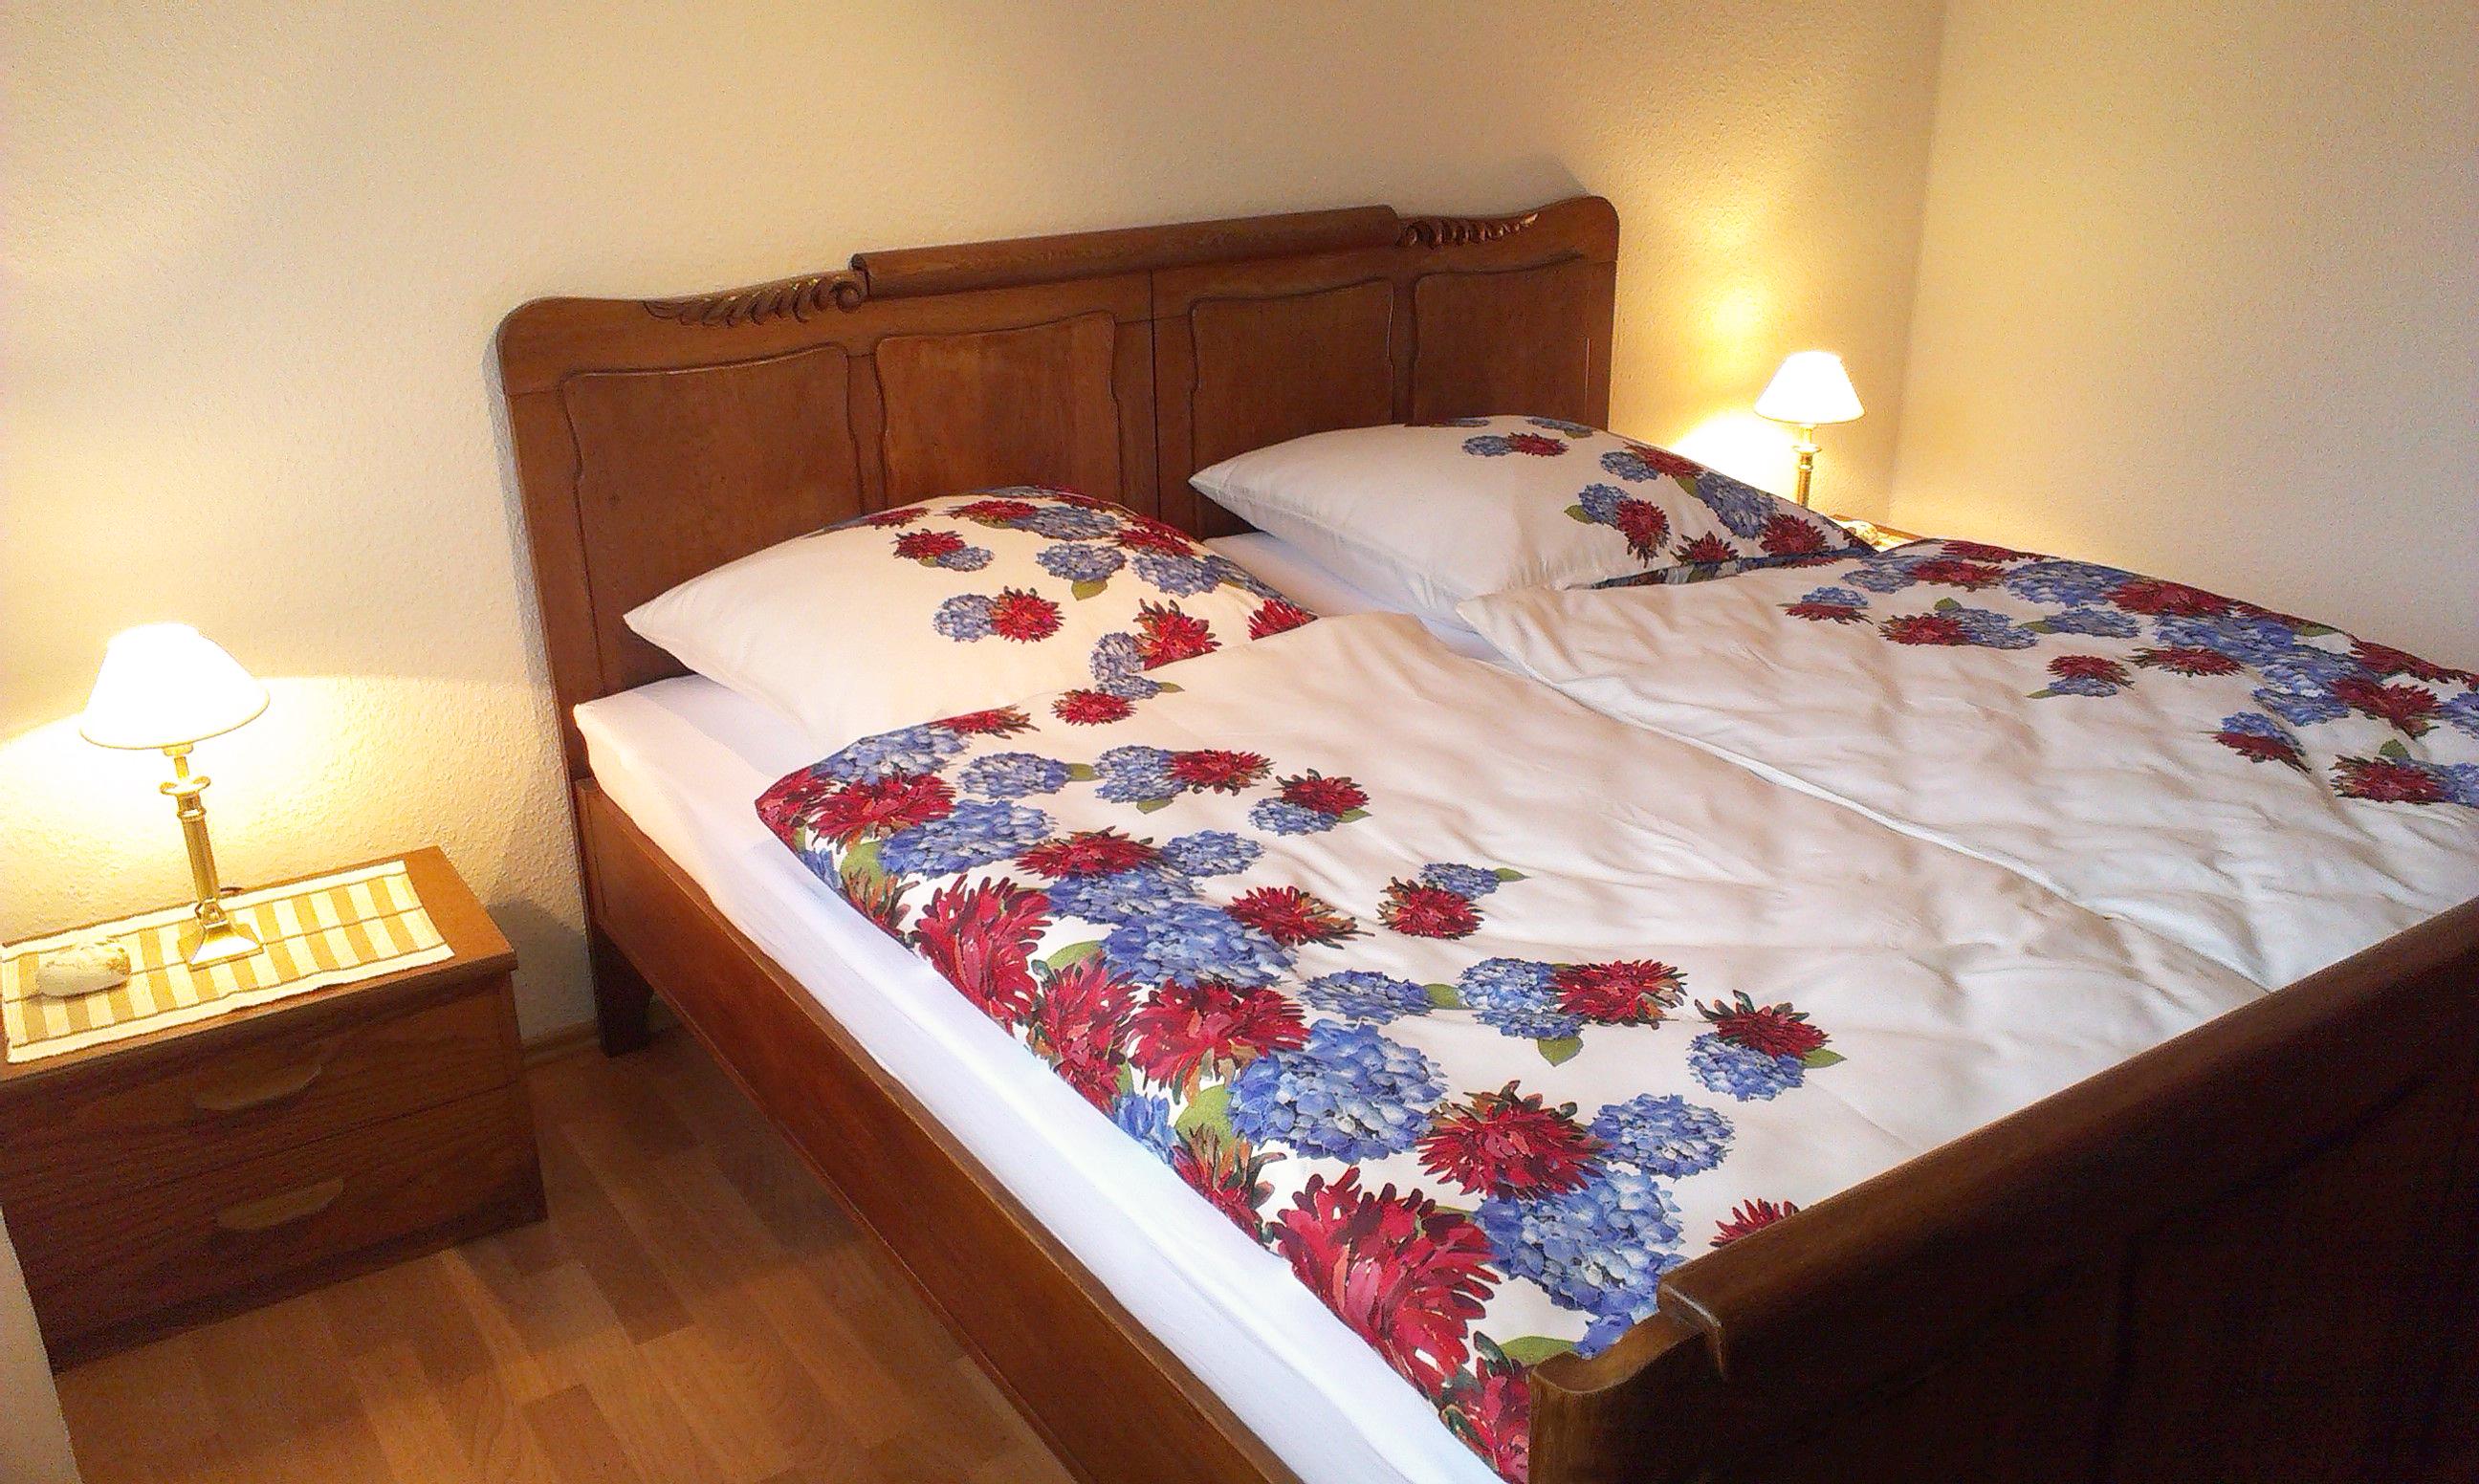 EG: Schlafzimmer mit Eichenholz-Doppelbett